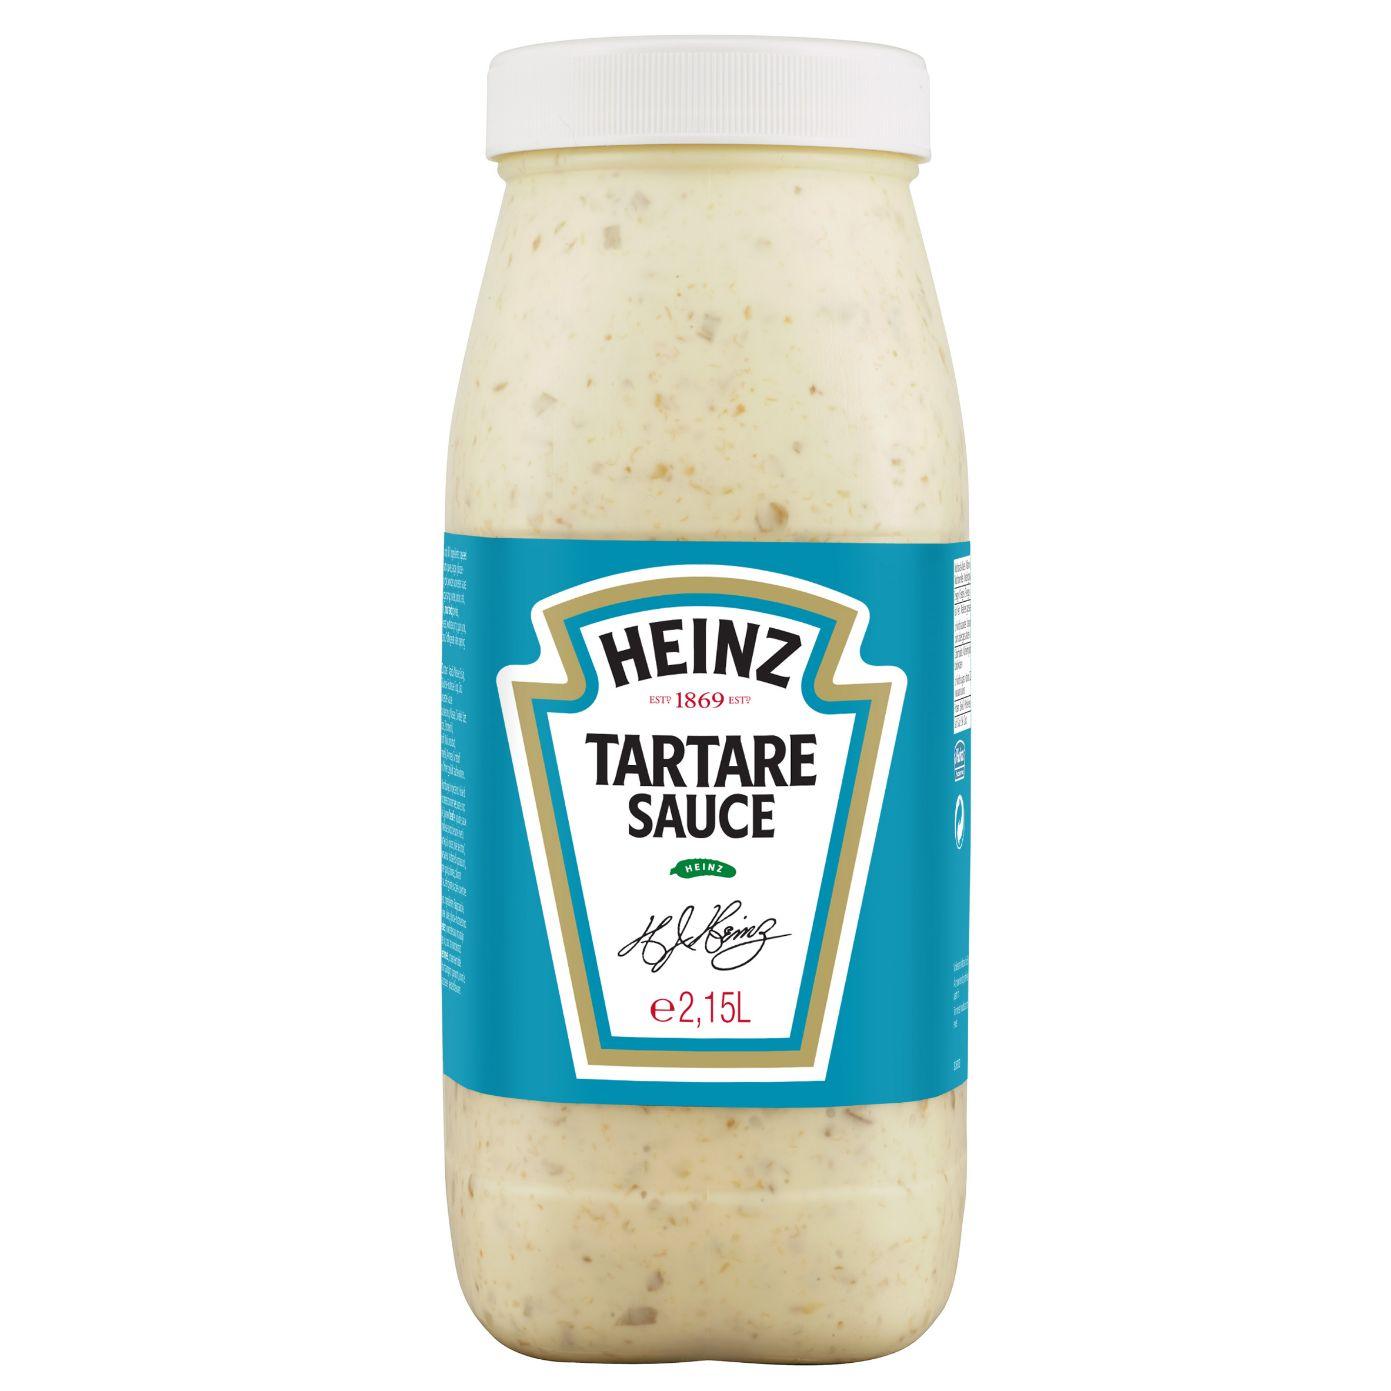 Heinz Sauce Tartare 2.15L Bidon image